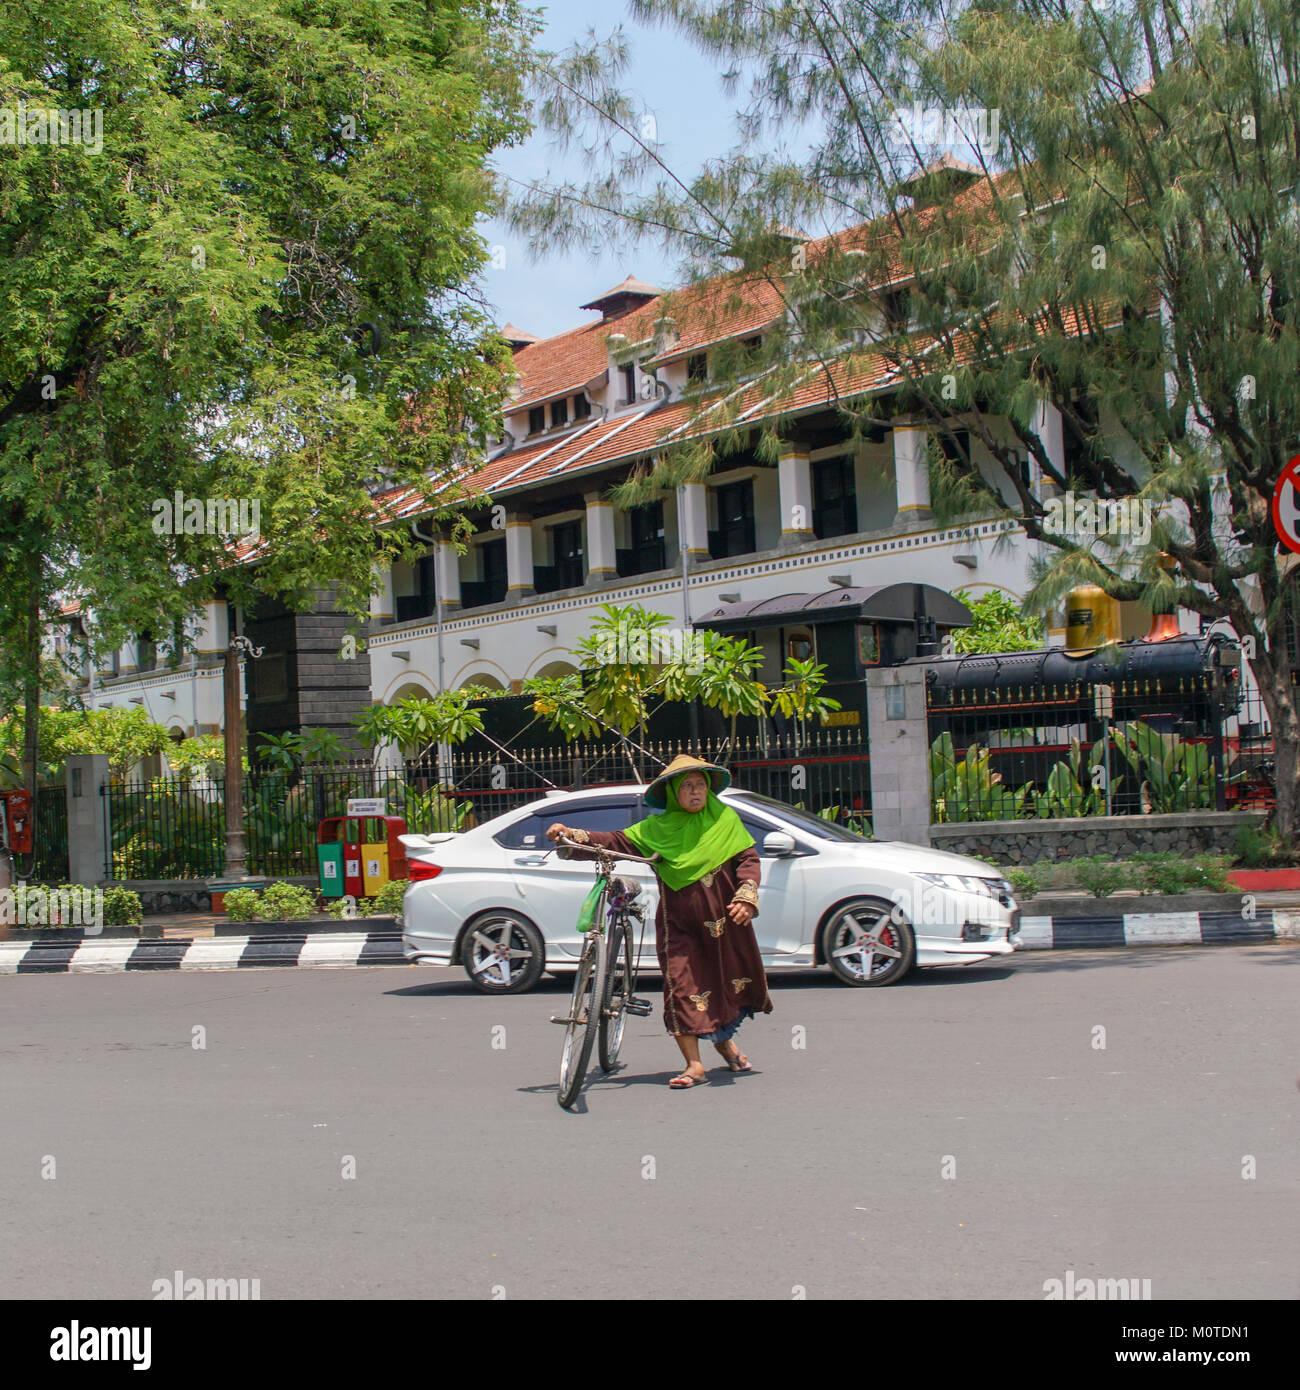 An older Javanese woman walks her bicycle across the street. Semarang, Java, Indonesia. The Railway Building is - Stock Image